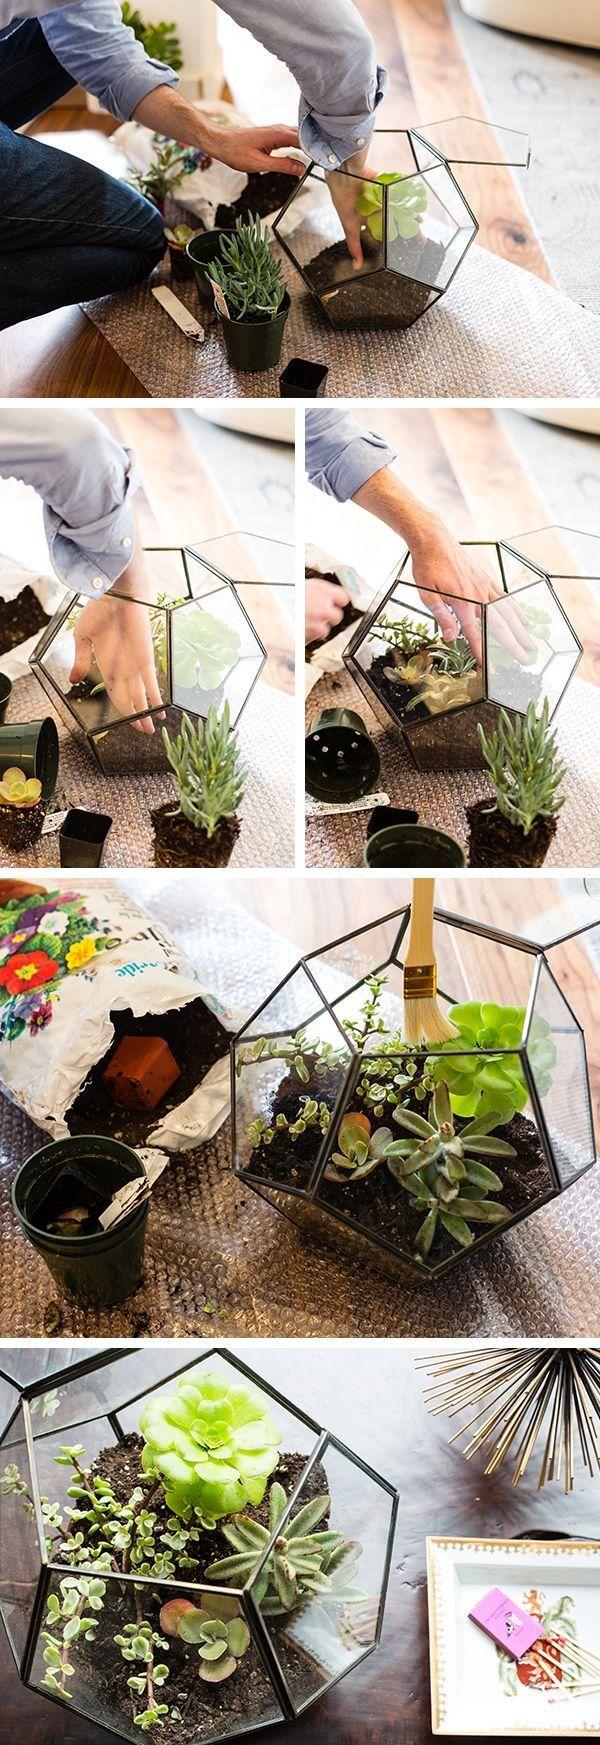 Creative ways to grow plants